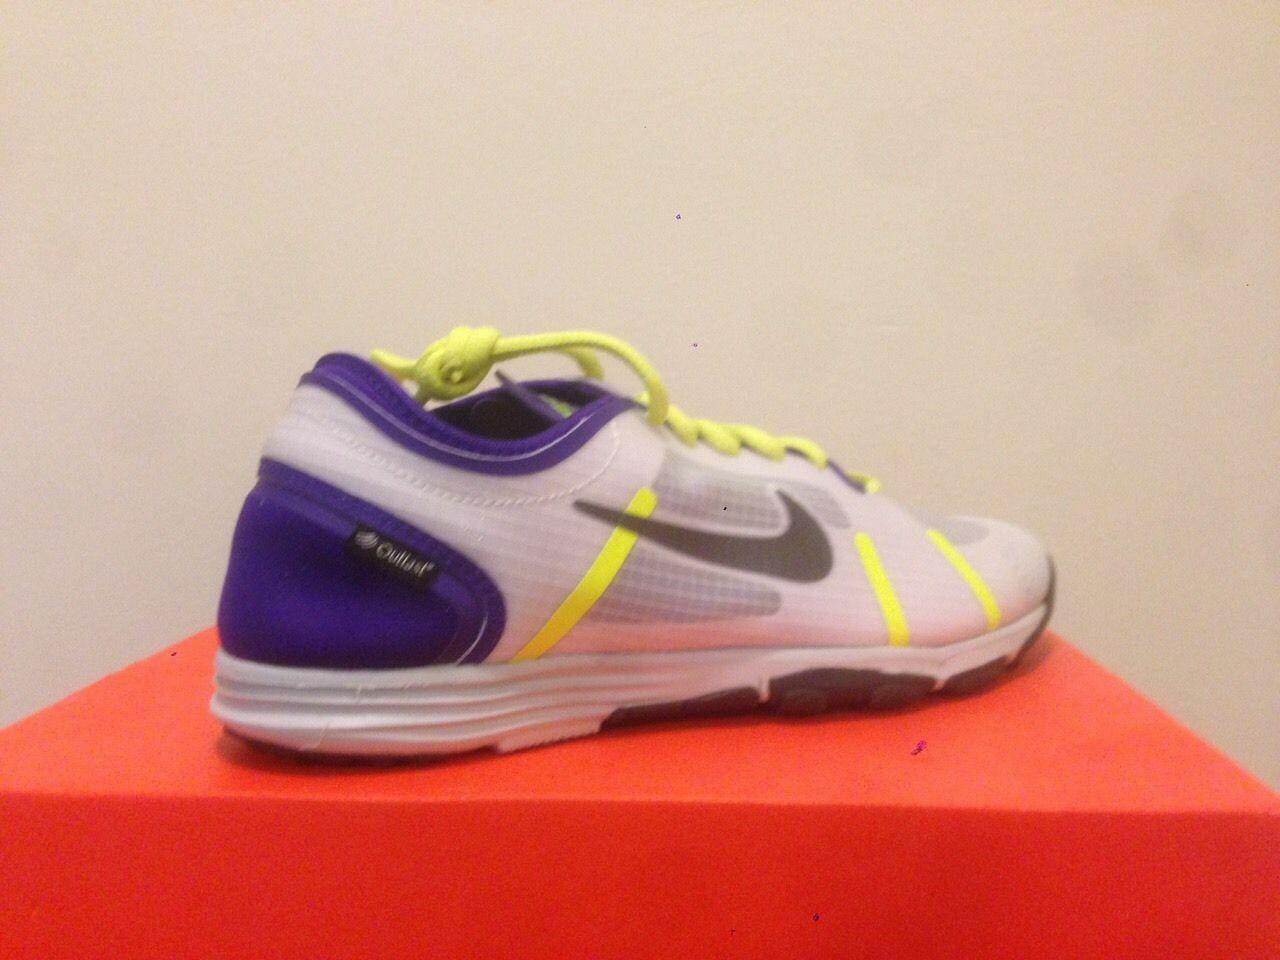 NEW No Box Women's Nike Lunar Element  Cross Training Sneakers Multi-color US 6